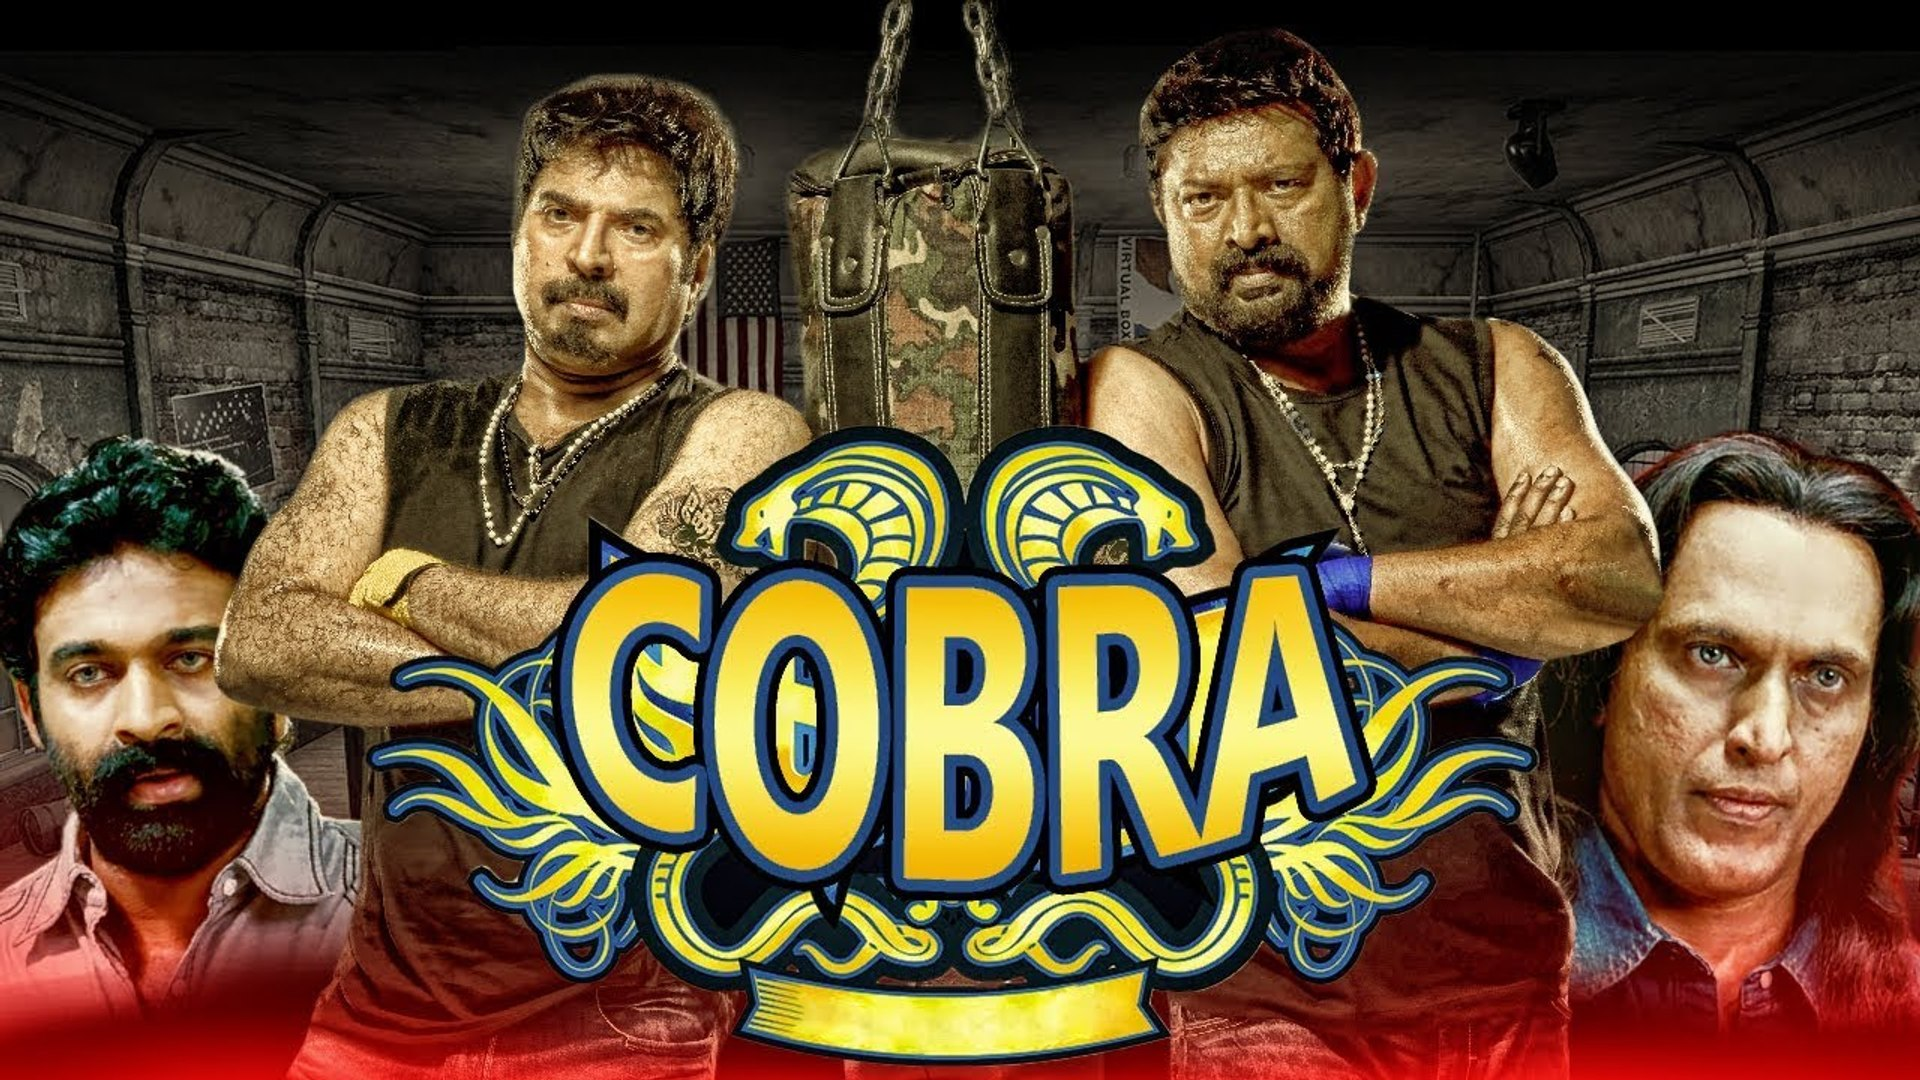 Cobra (2019) New Released Hindi Dubbed Full Movie - Mammootty, Lal, Lalu Alex, Padmapriya